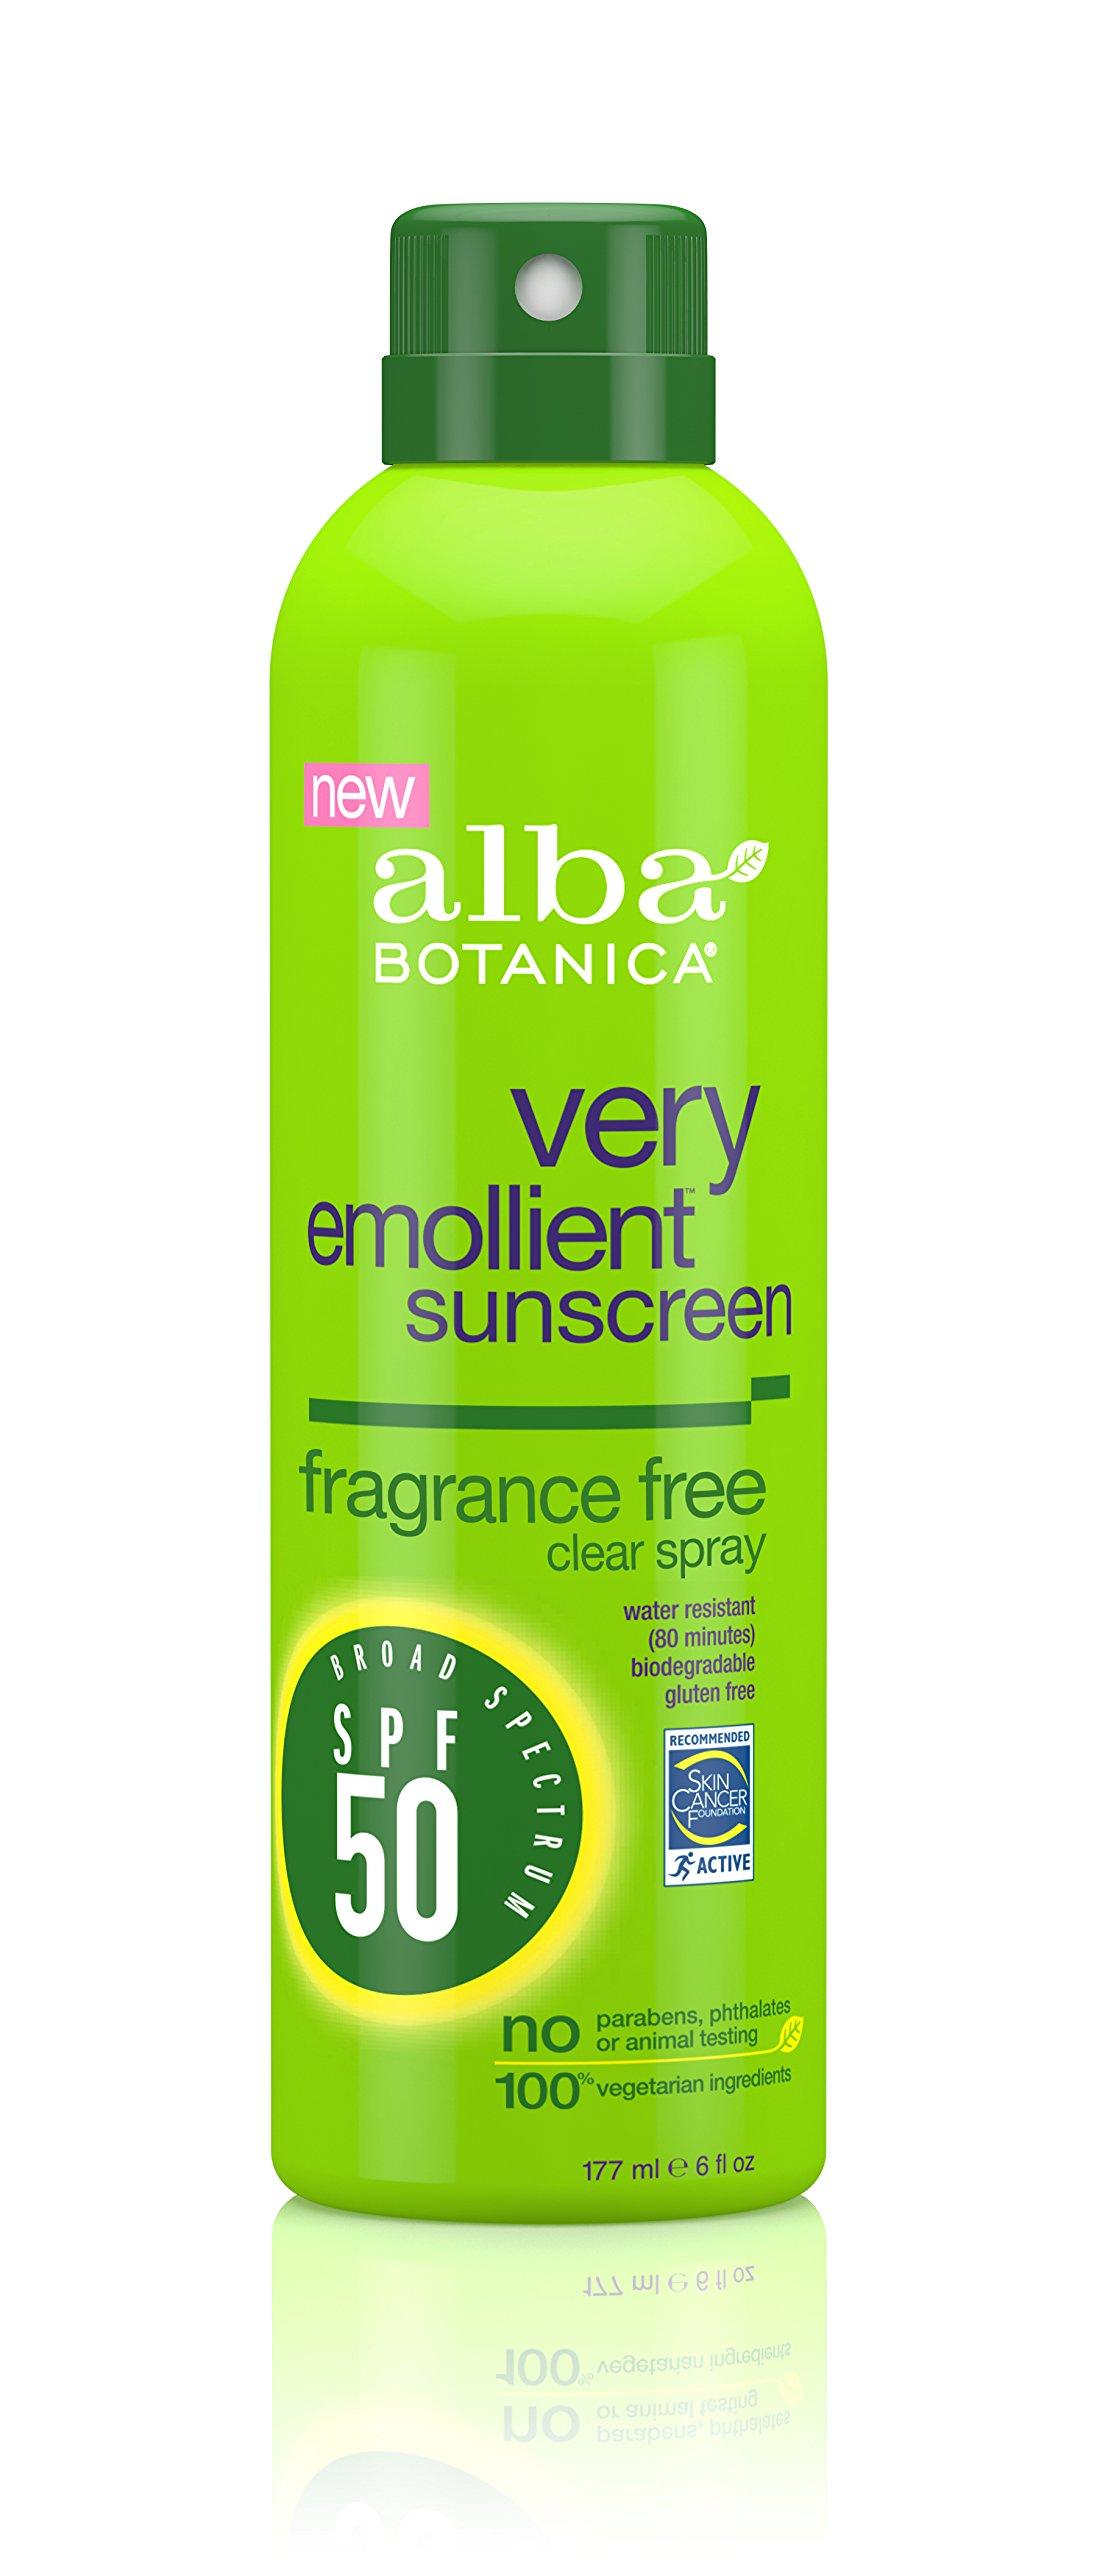 Alba Botanica Very Emollient, Fragrance Free Spray Sunscreen SPF 50, 6 Ounce